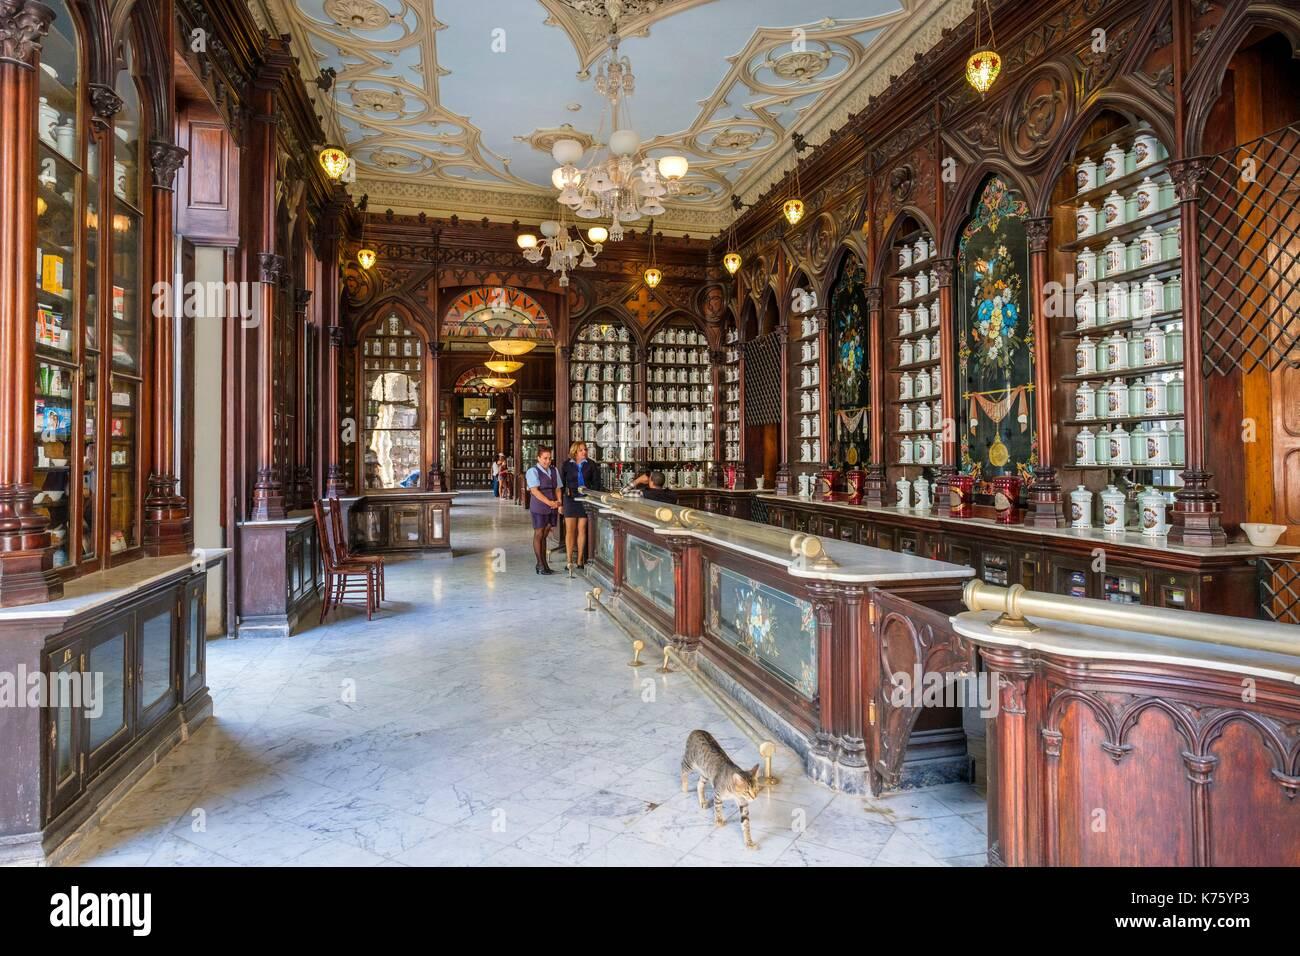 Cuba, Havana, Habana Vieja district (UNESCO World Heritage site), calle Teniente Rey (Brasil), La Reunion pharmacy-museum - Stock Image